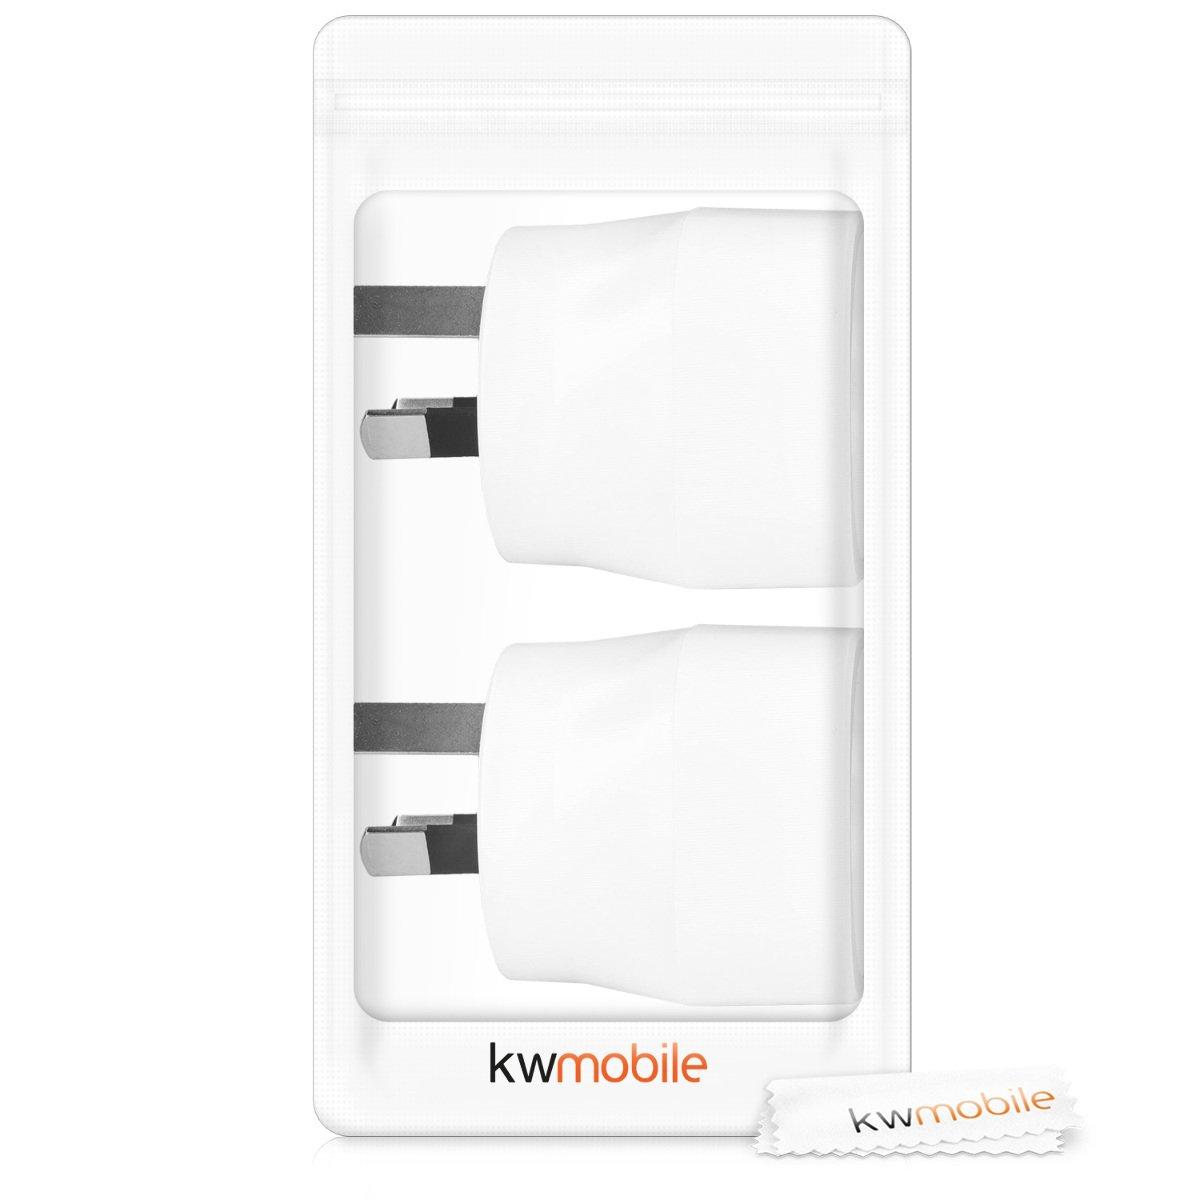 kwmobile 2X Adaptador de Viaje para Australia Tipo I: Amazon.es: Electrónica